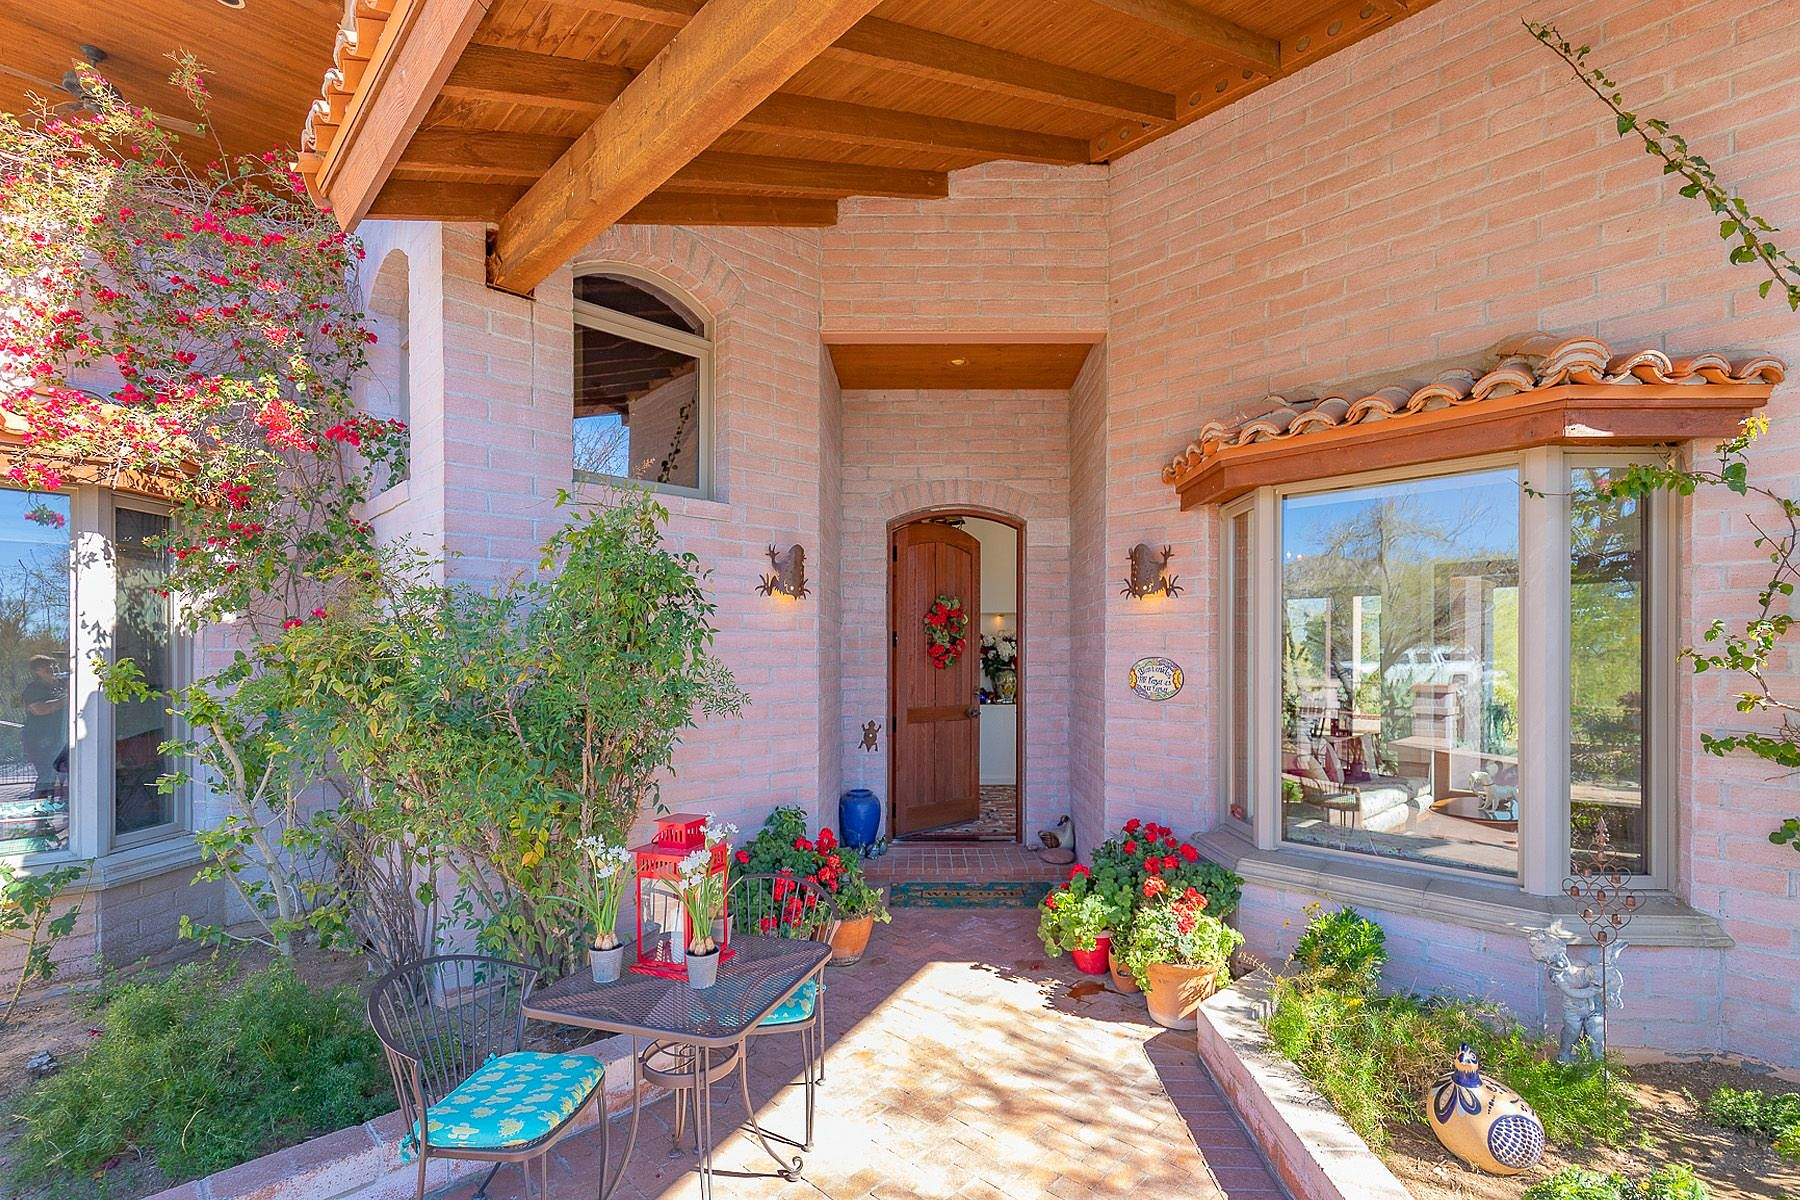 3 Bedrooms / 3 Bathrooms - Est. $7,837.00 / Month* for rent in Tucson, AZ